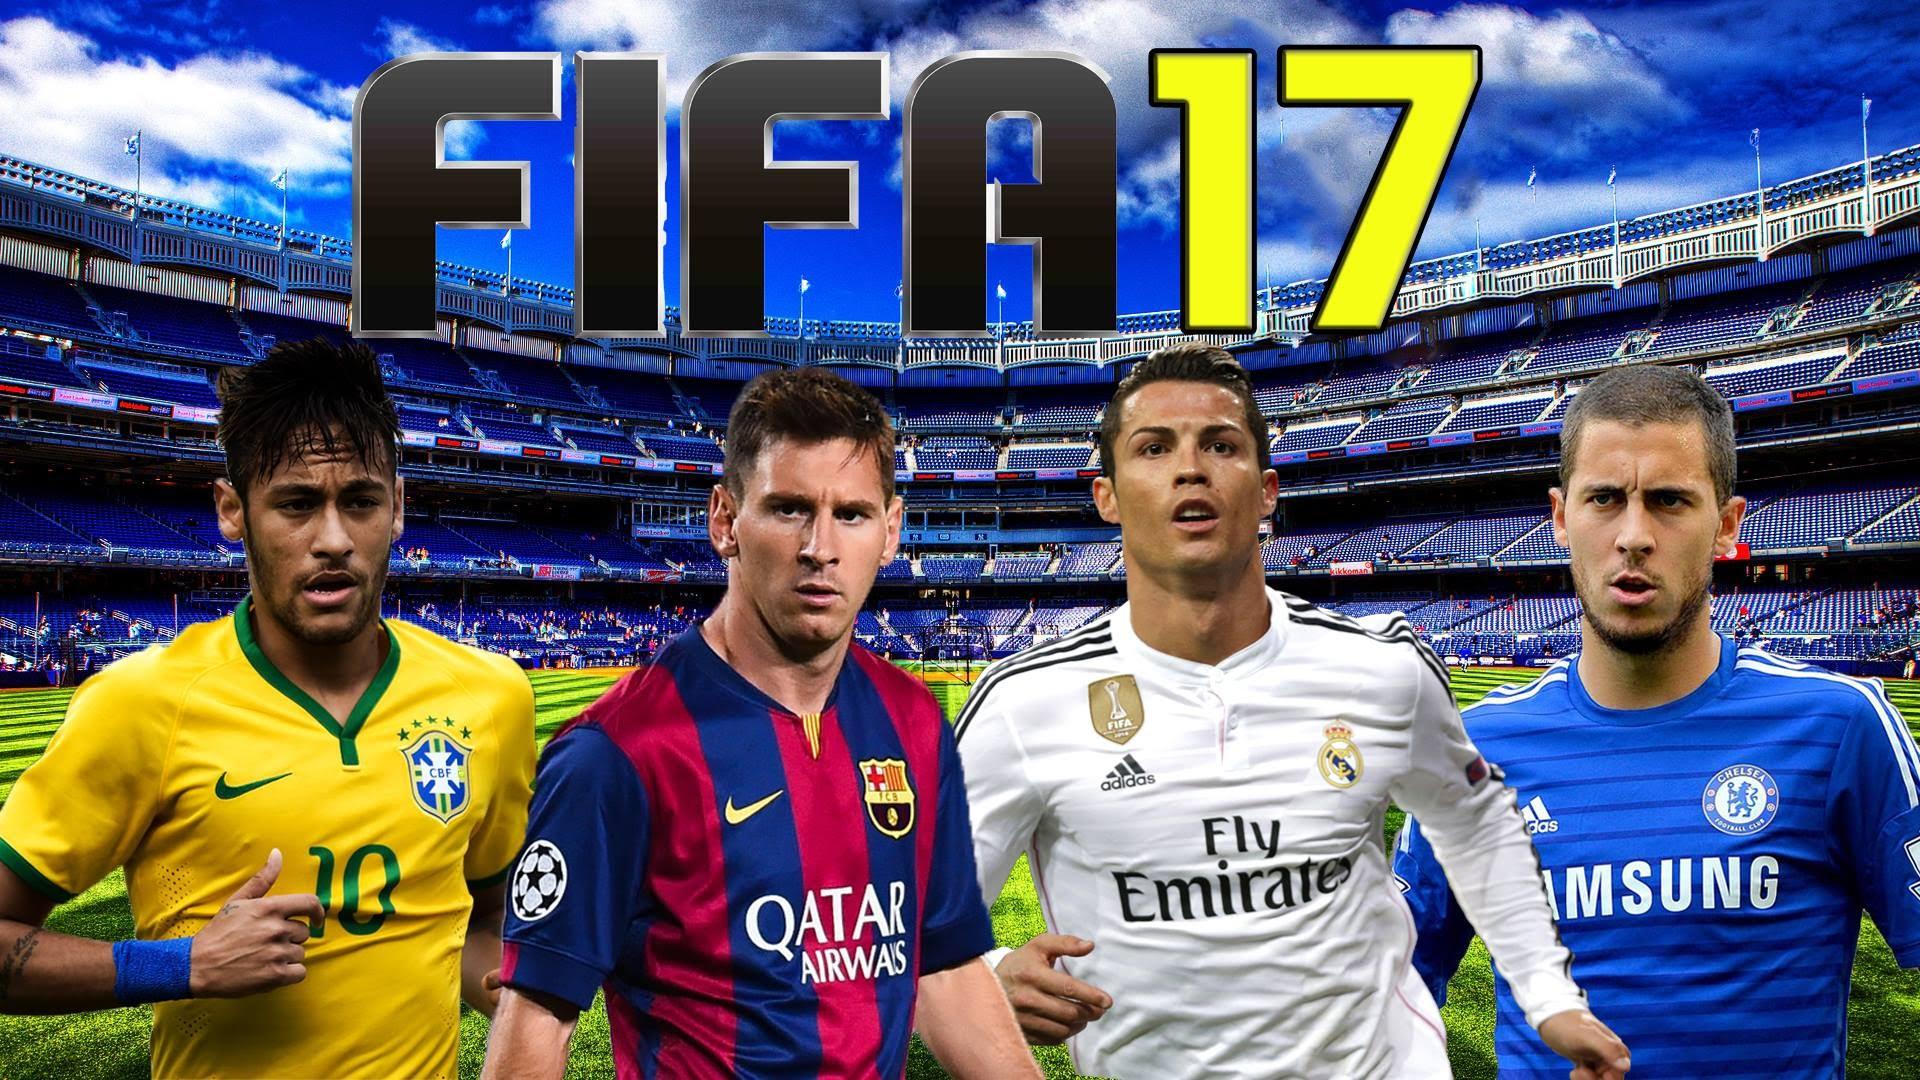 FIFA 17-toernooi bij PEC Zwolle